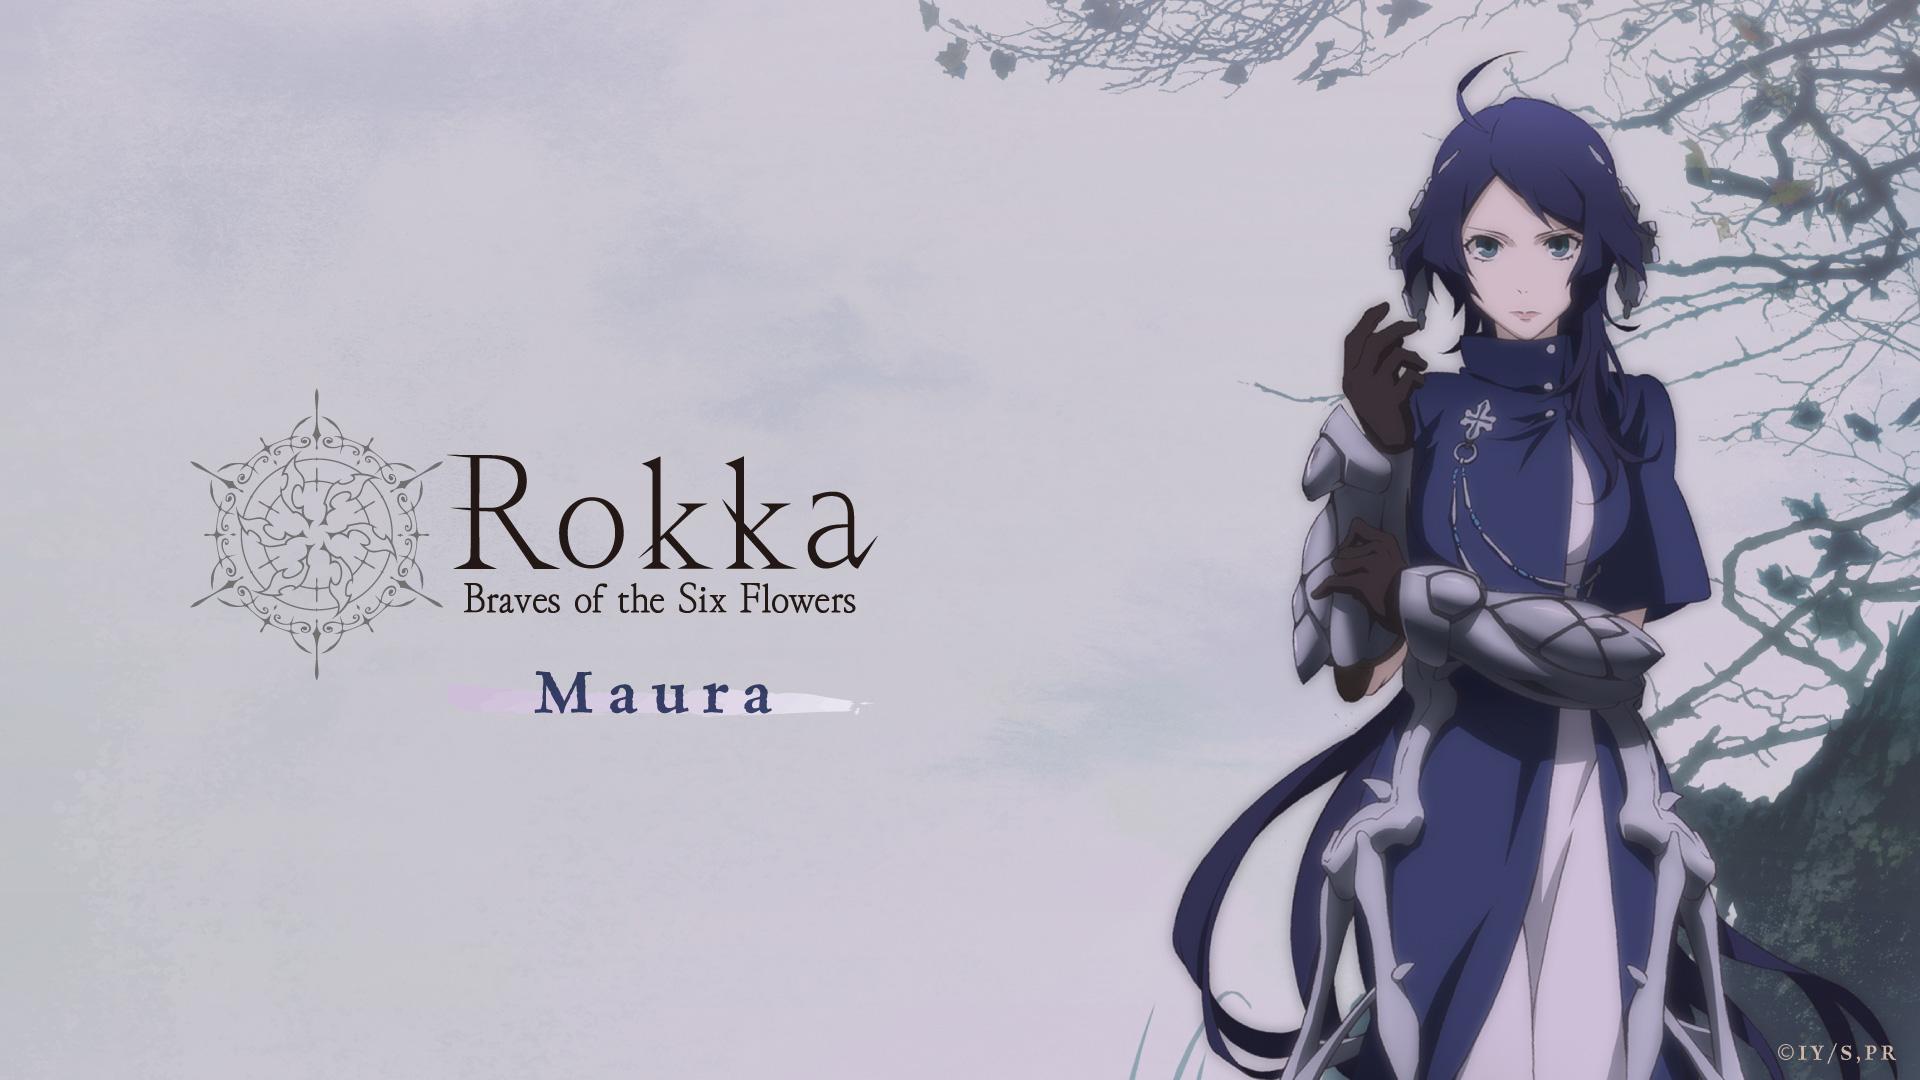 Rokka-no-Yuusha-Anime-Wallpaper-Maura-Chester